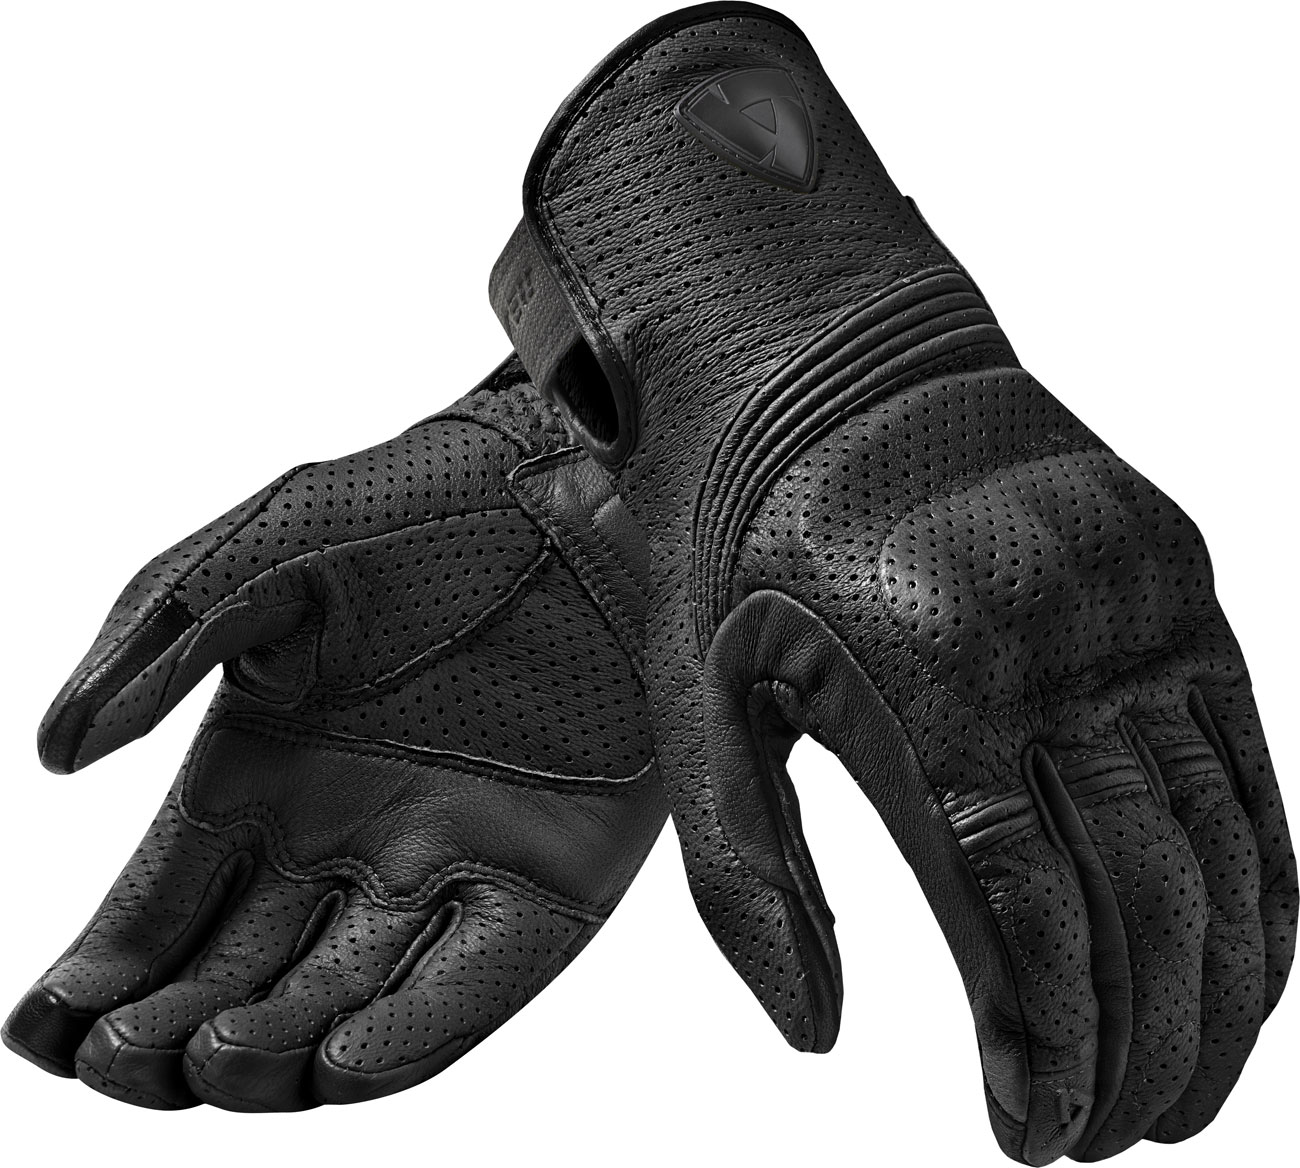 Revit Fly 3, Handschuhe - Schwarz - 4XL FGS151-0010-XZL